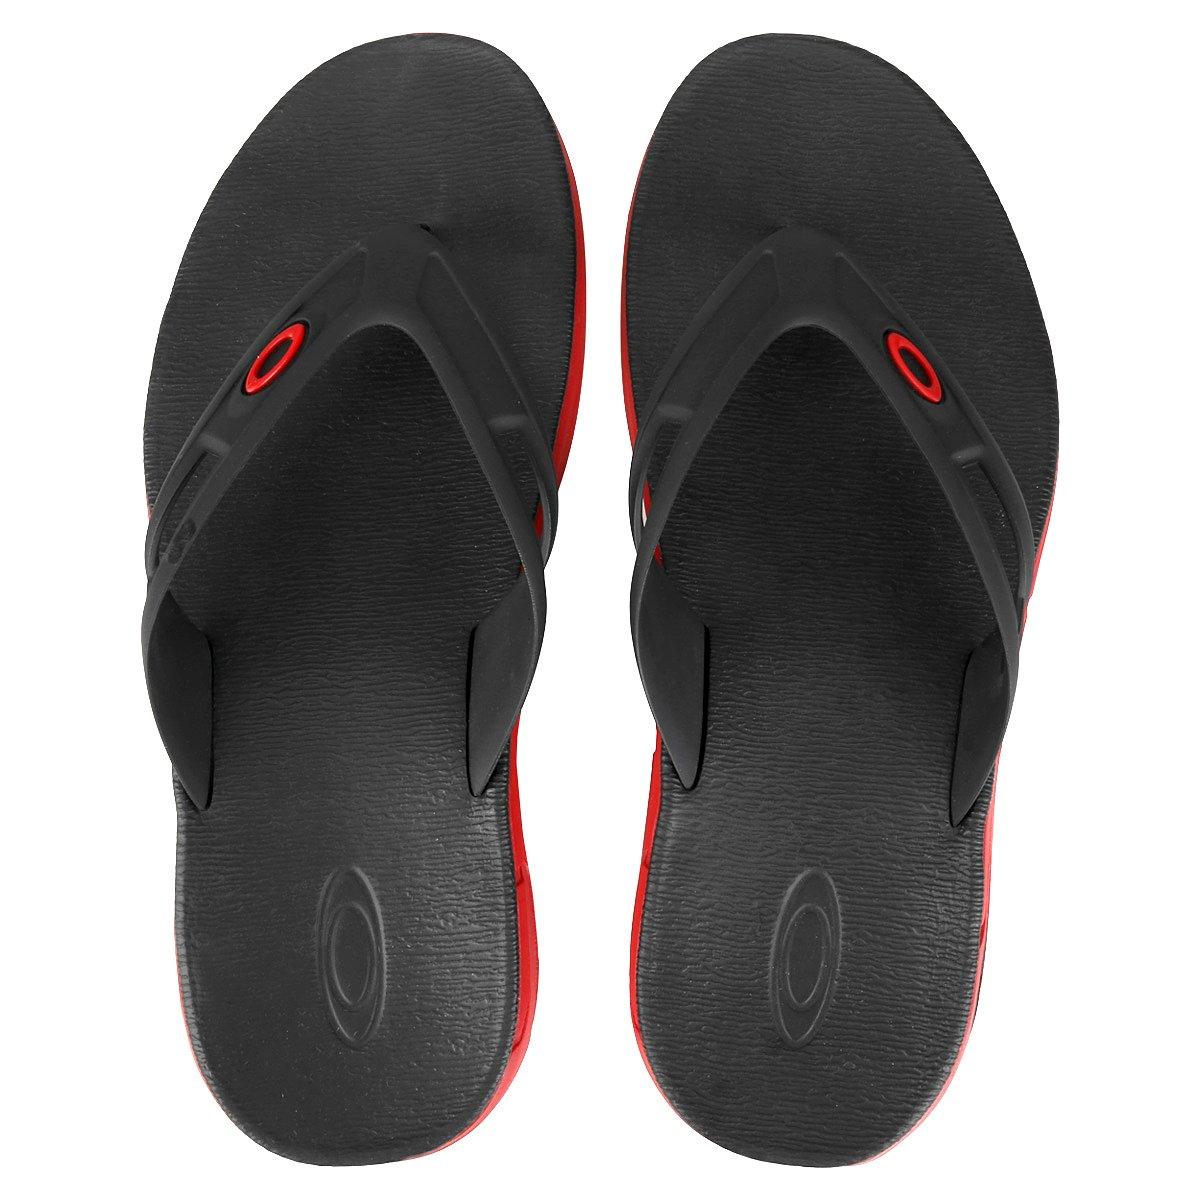 97cd2233c Sandália Papete Democrata Pacific Masculina. A partir de. 9.100 Pontos.  FornecedorNetshoes. Chinelo Oakley Rest Masculino